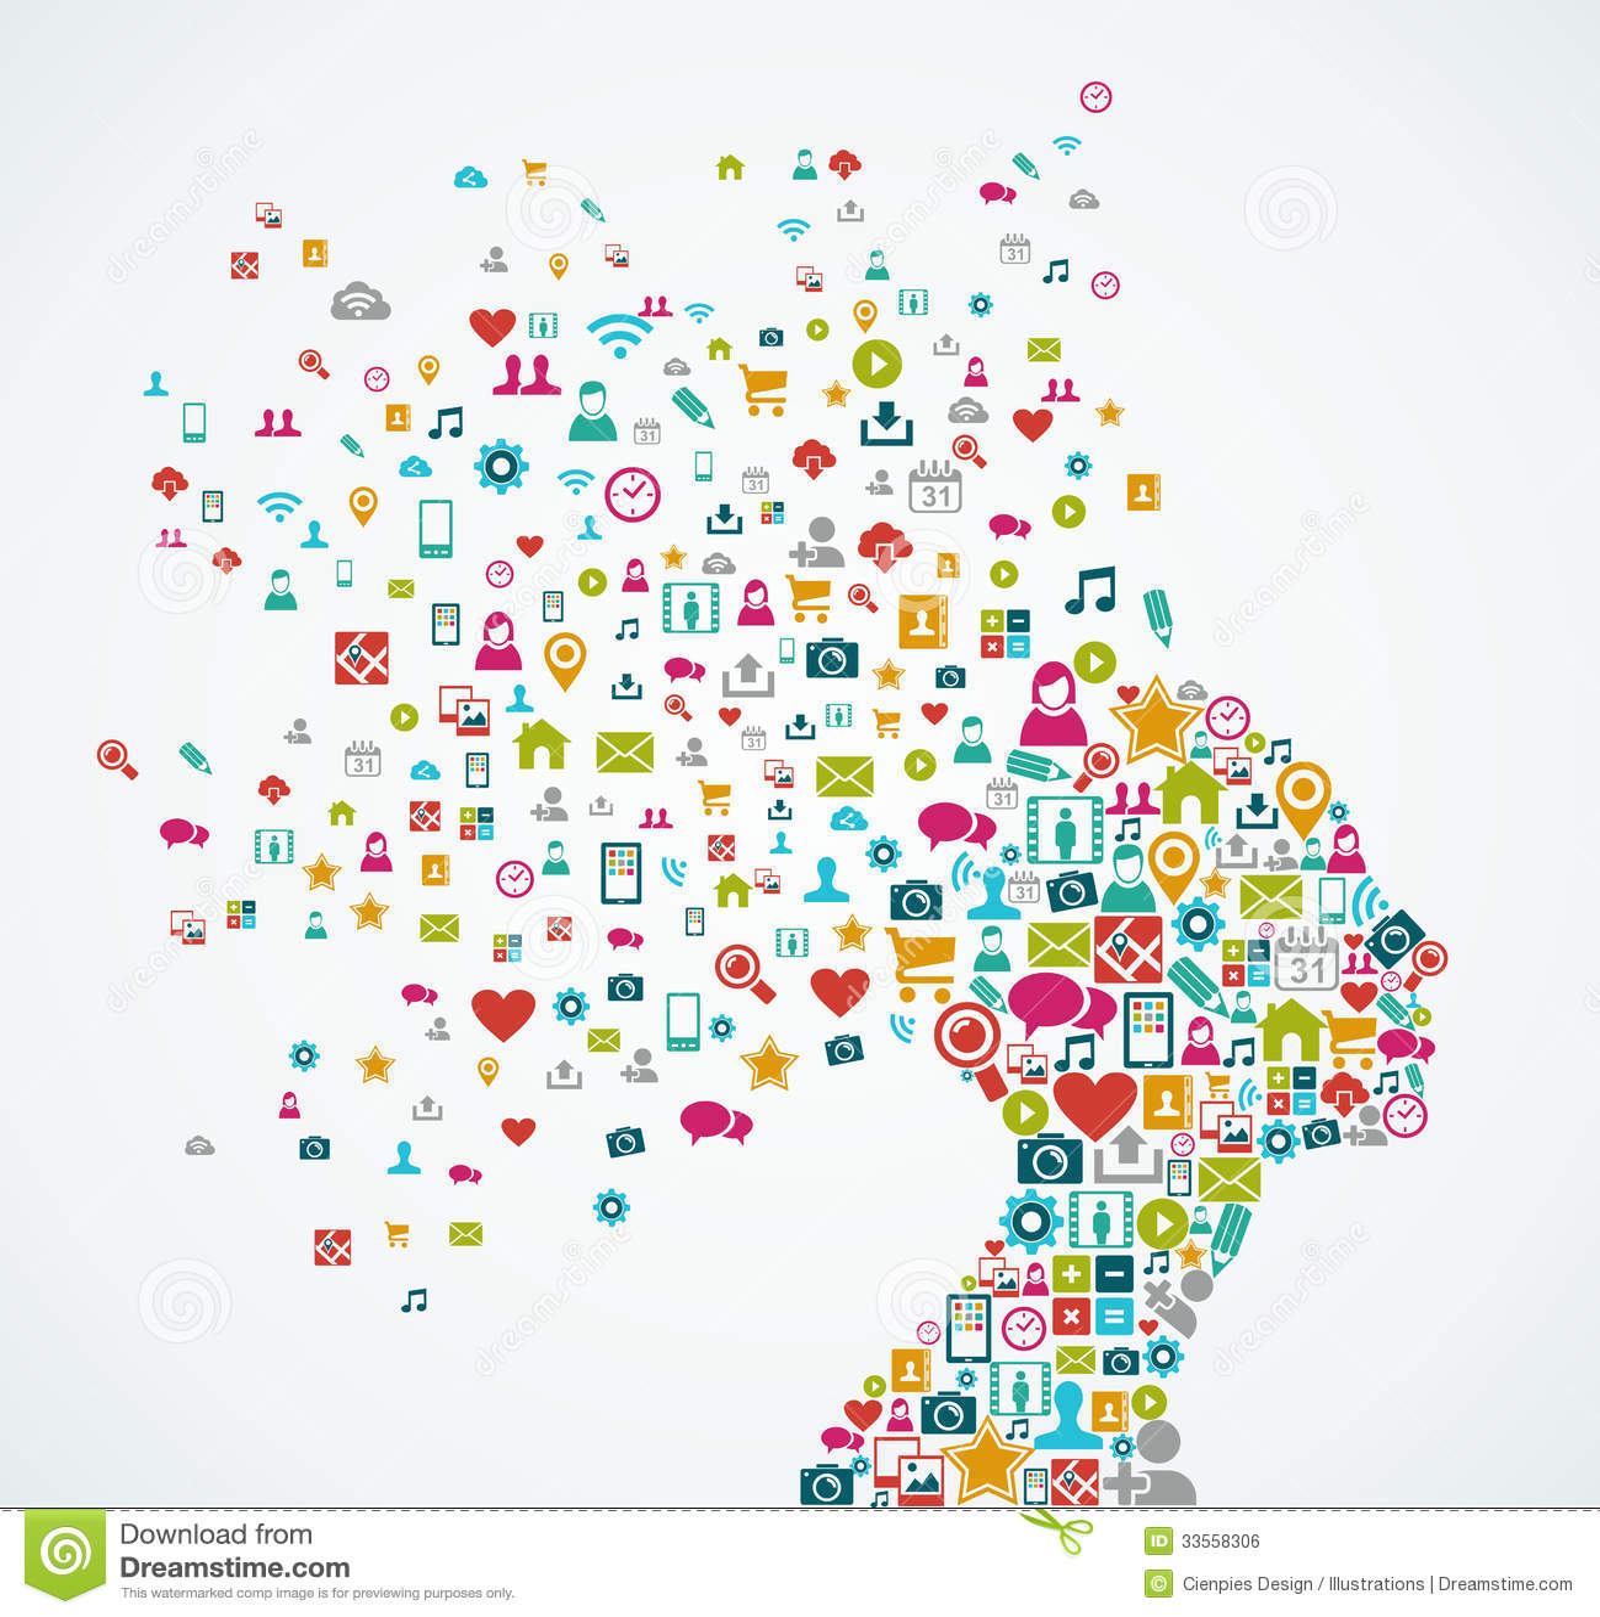 Female human head shape with social media icons de